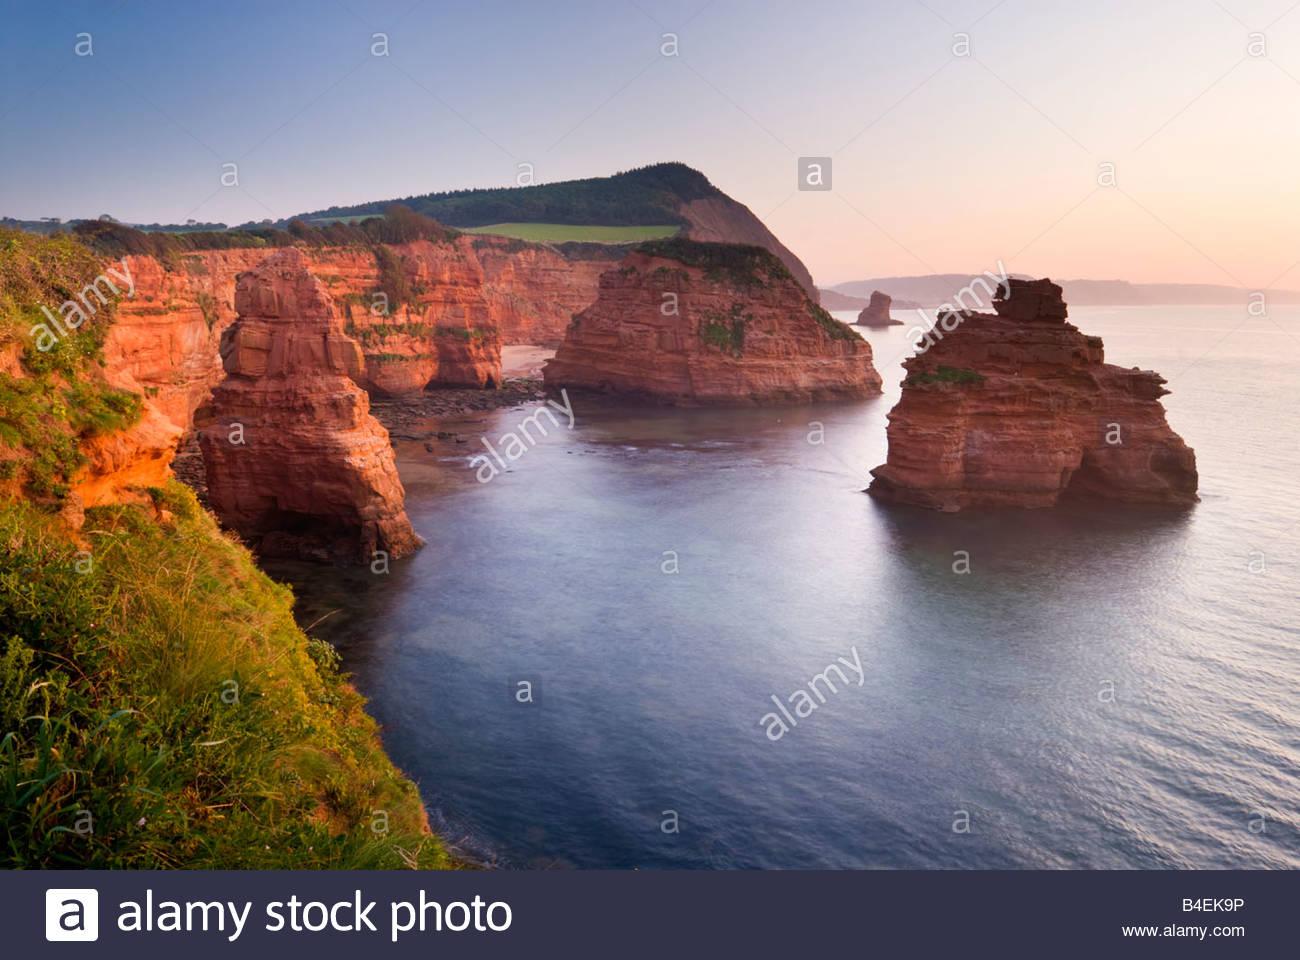 Ladram Bay, near Sidmouth, East Devon, South West England. - Stock Image